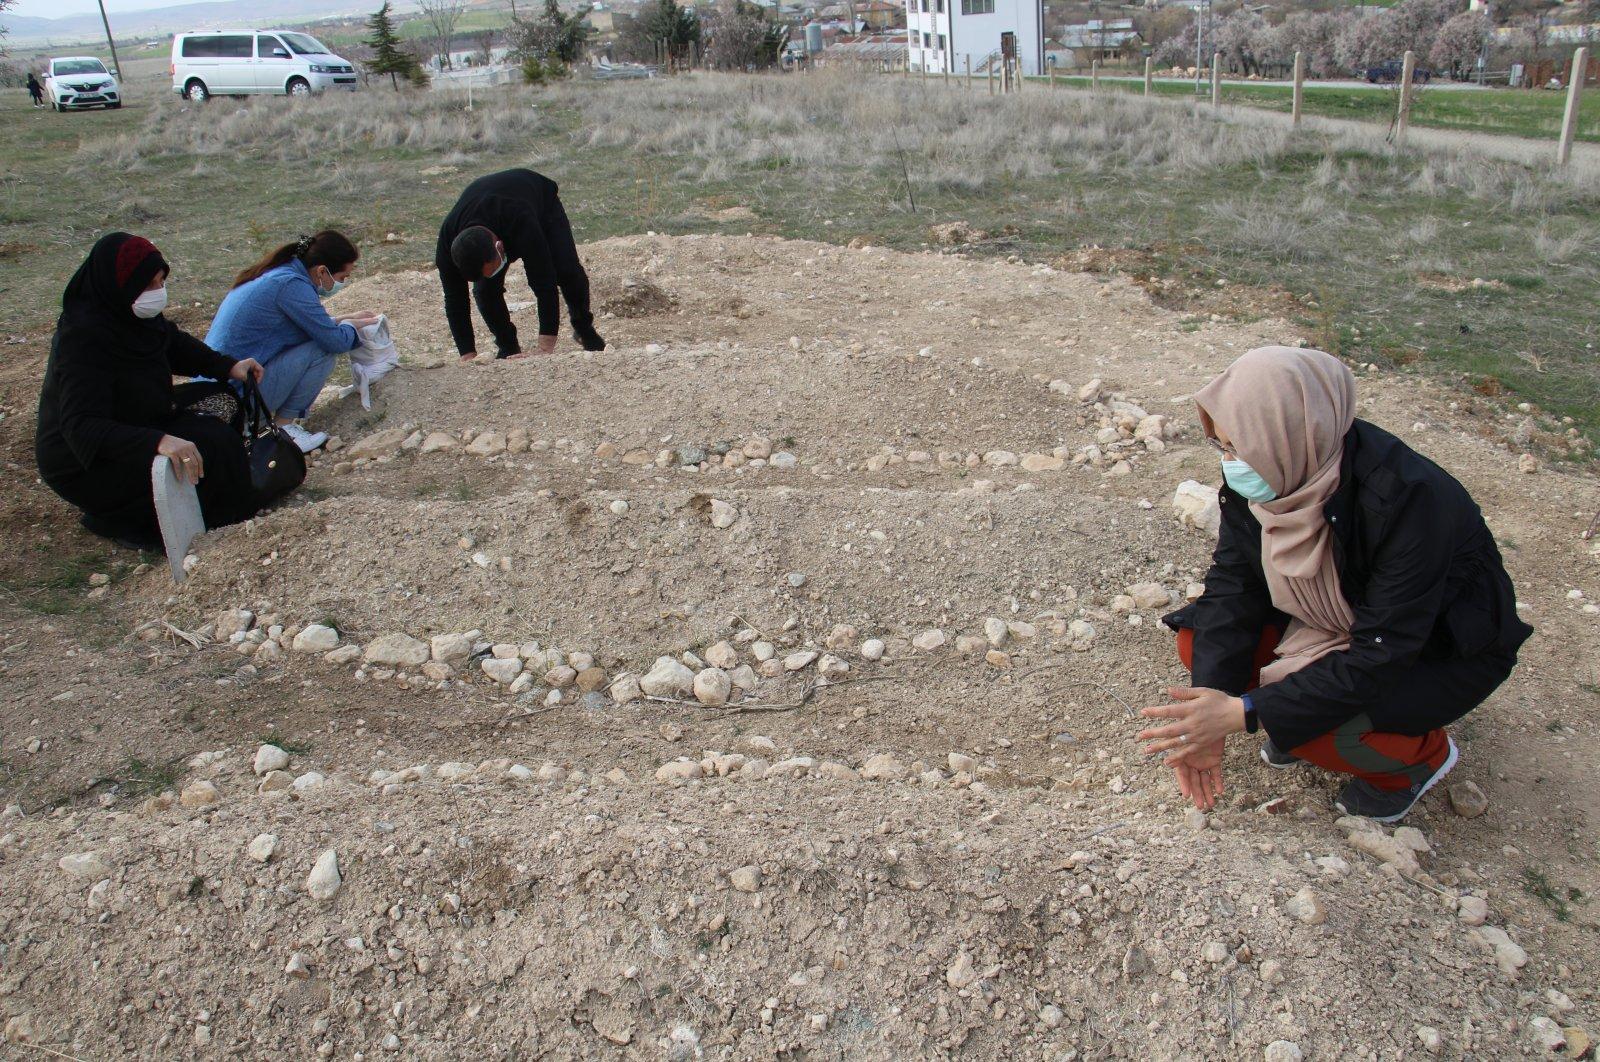 Relatives visit the graves of their family members, in Elazığ, eastern Turkey, April 1, 2021. (IHA PHOTO)